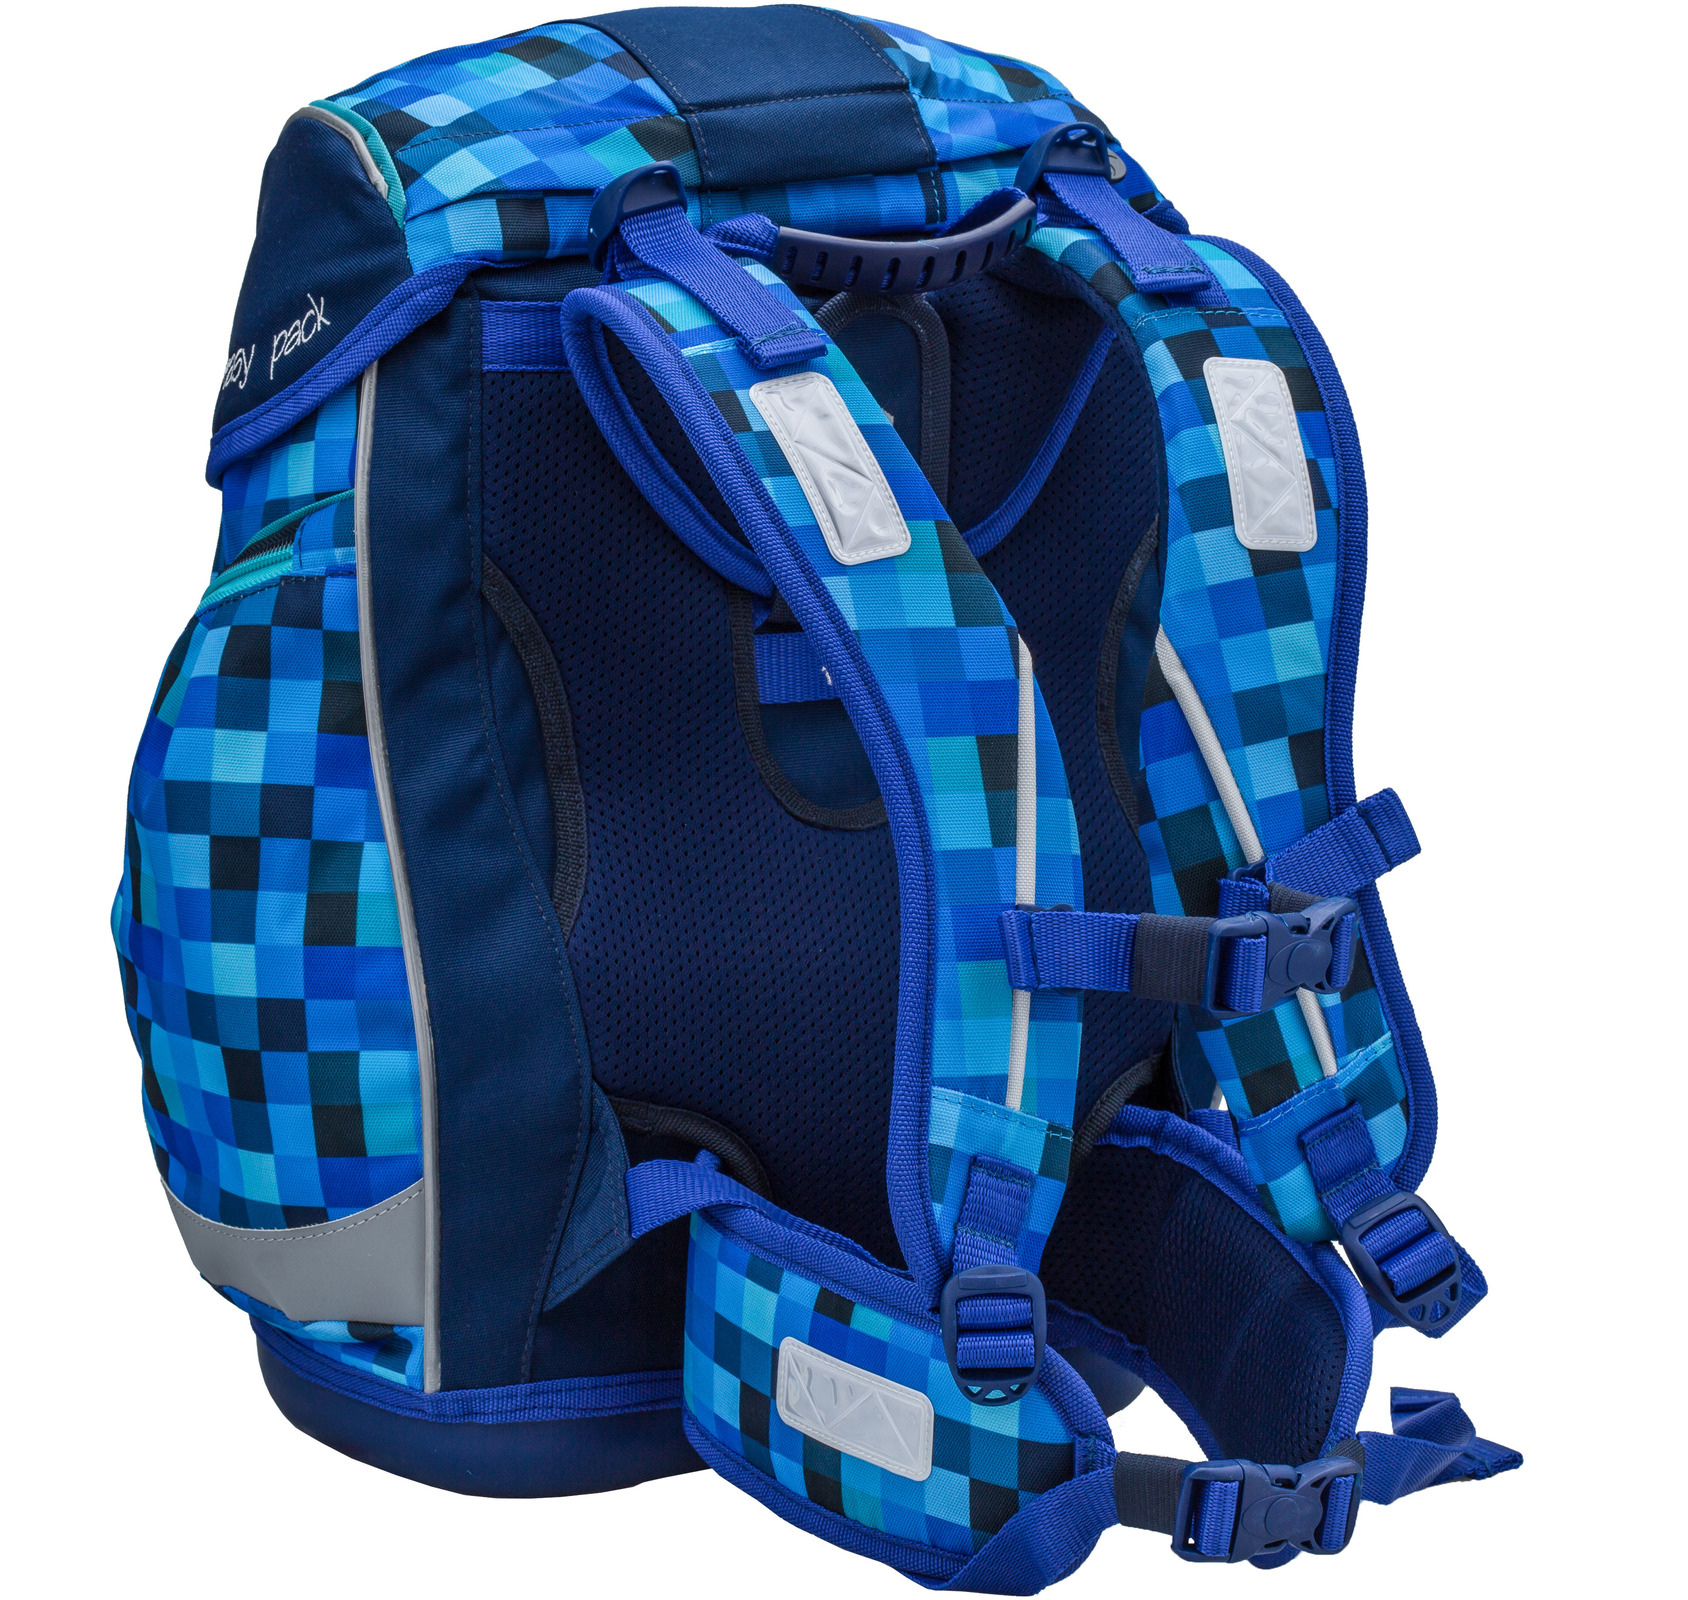 Ранец Belmil EASY PACK 404-40 BLUE PACK + мешок, - фото 4